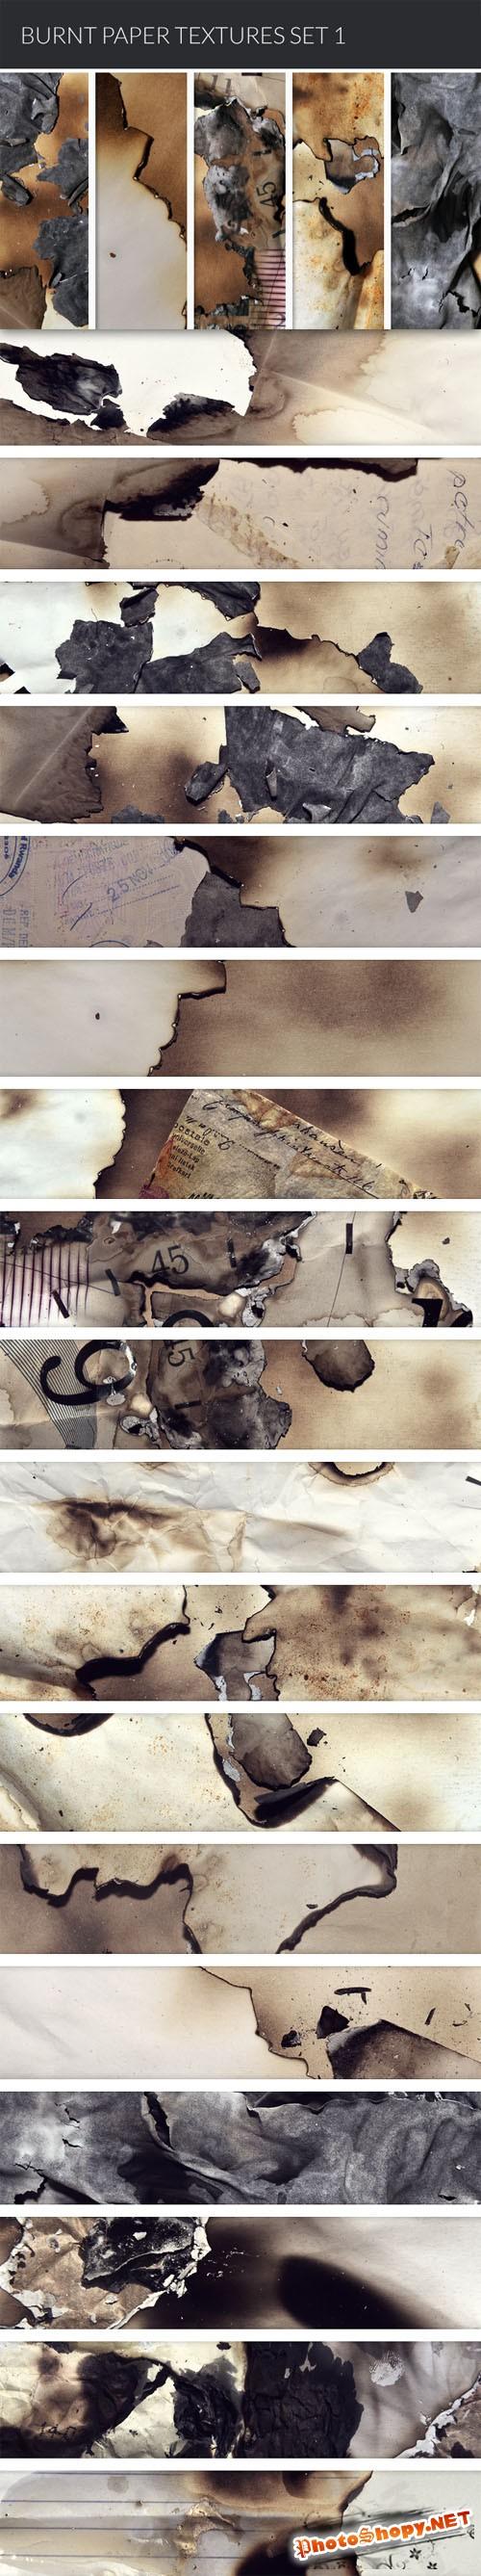 Designtnt - Burnt Paper Textures